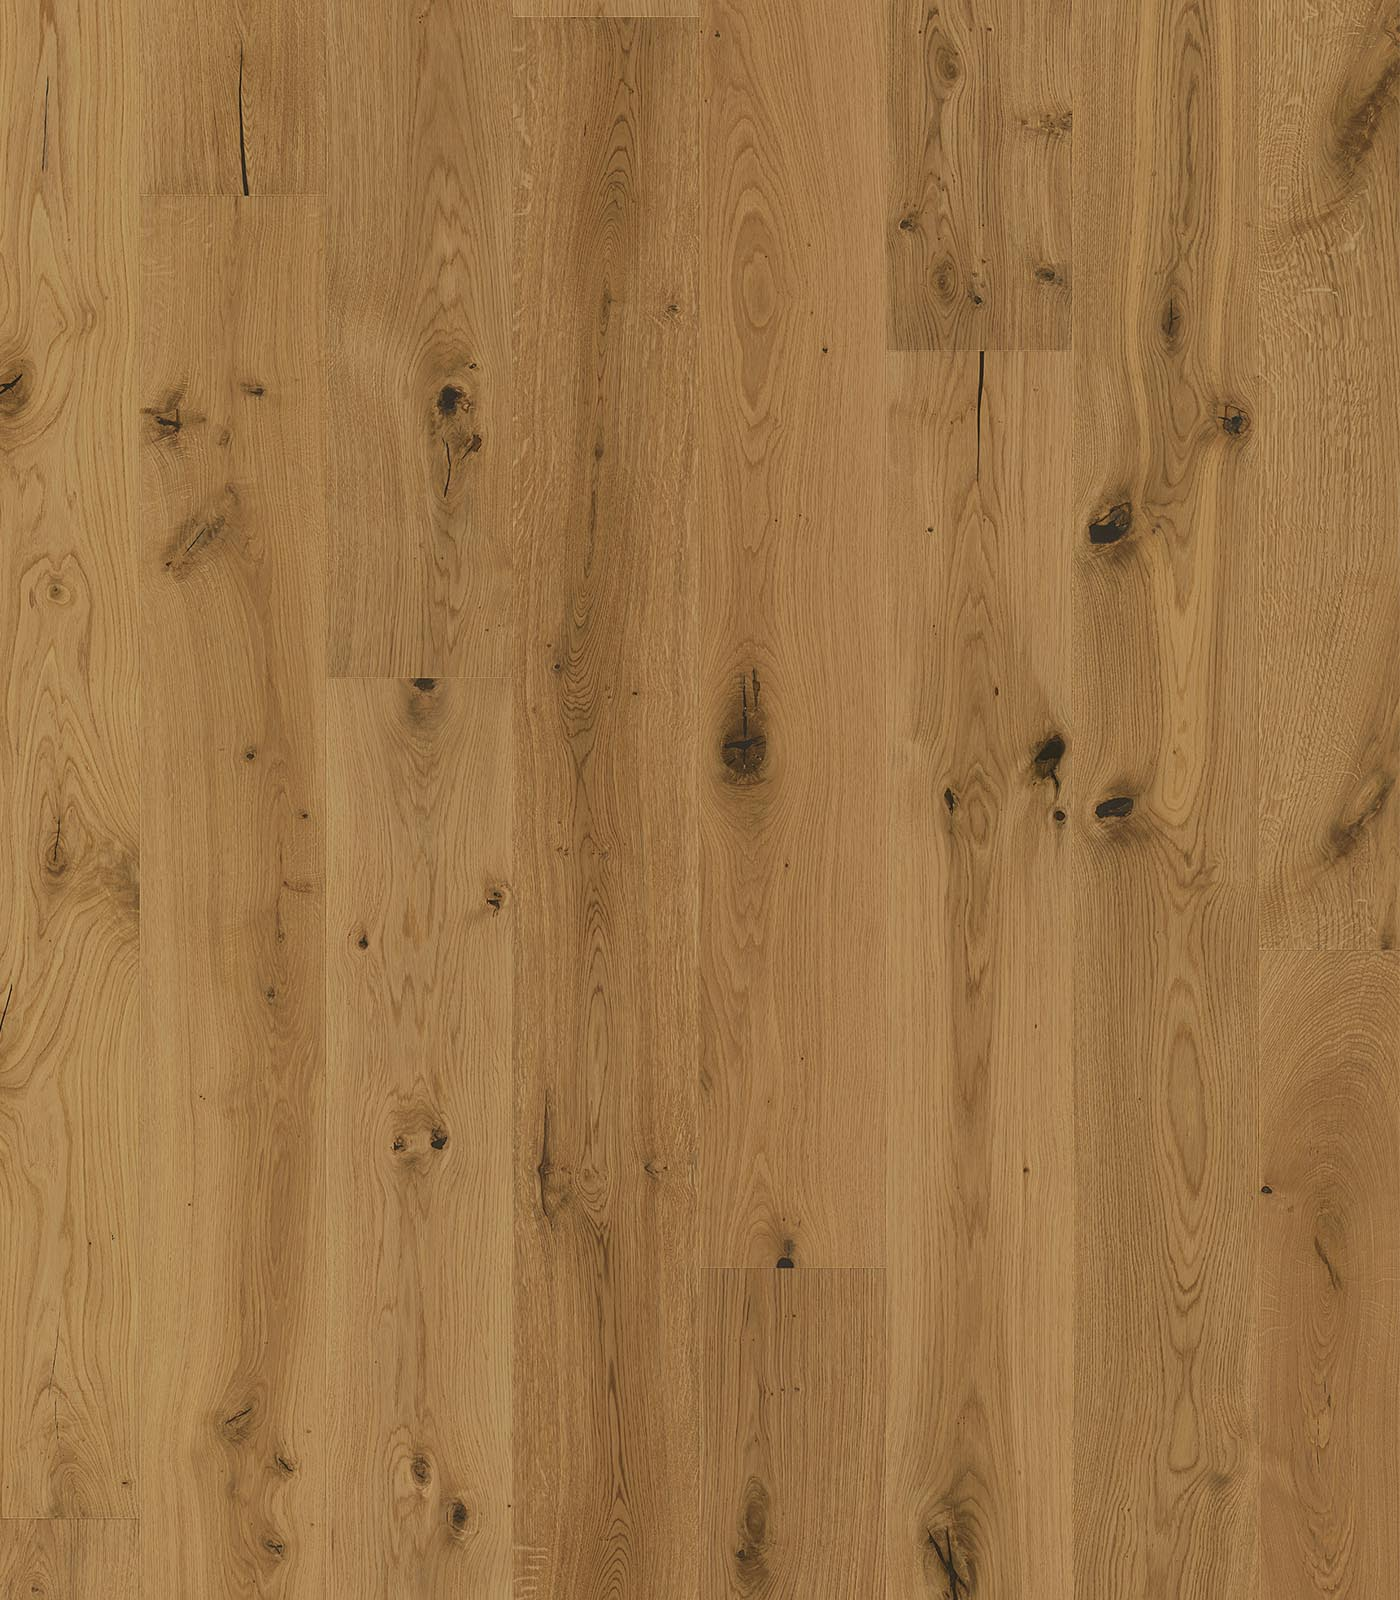 Oak Antique- Antique-grading-of-European-Oak-floors-Forestry-Timber-flat